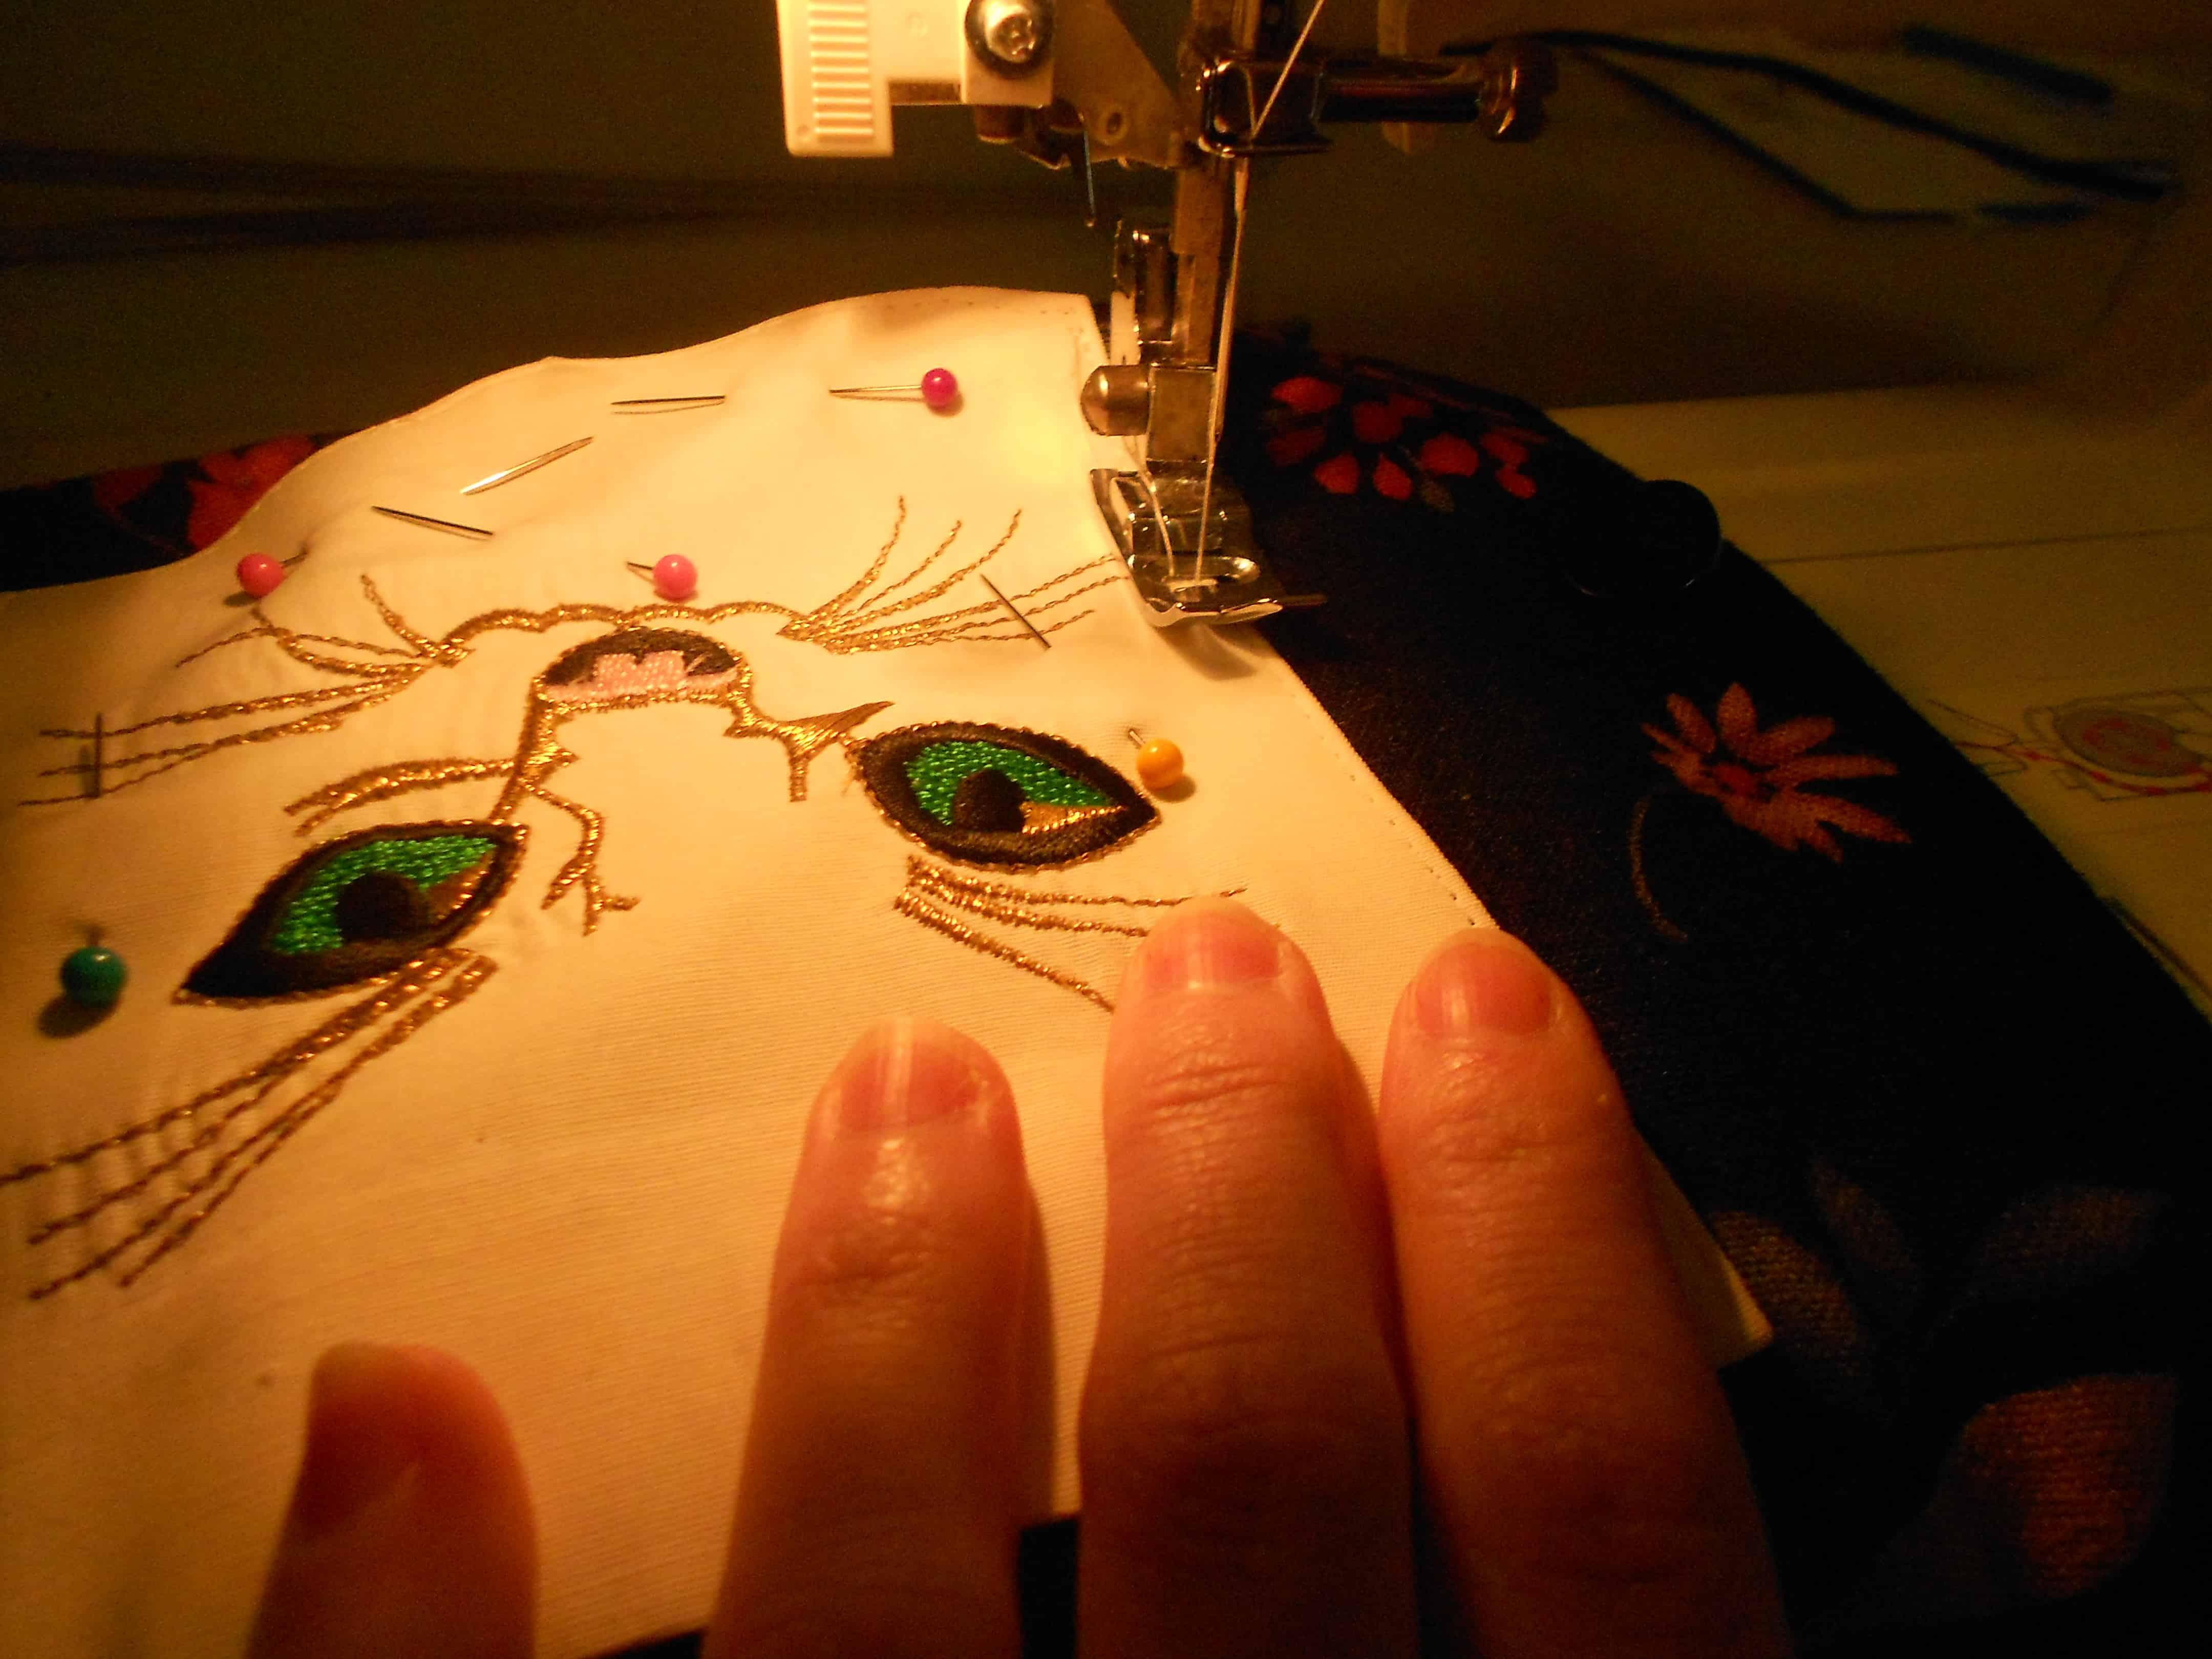 sewing cat pocket onto dress